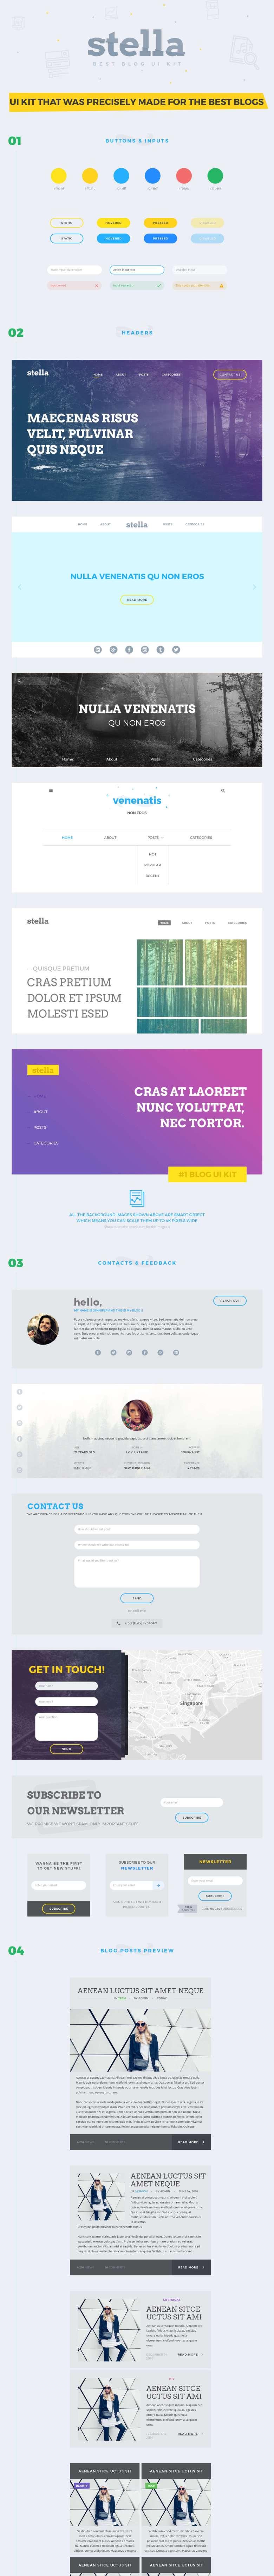 Stella-Blog-Free-UI-Kit-preview